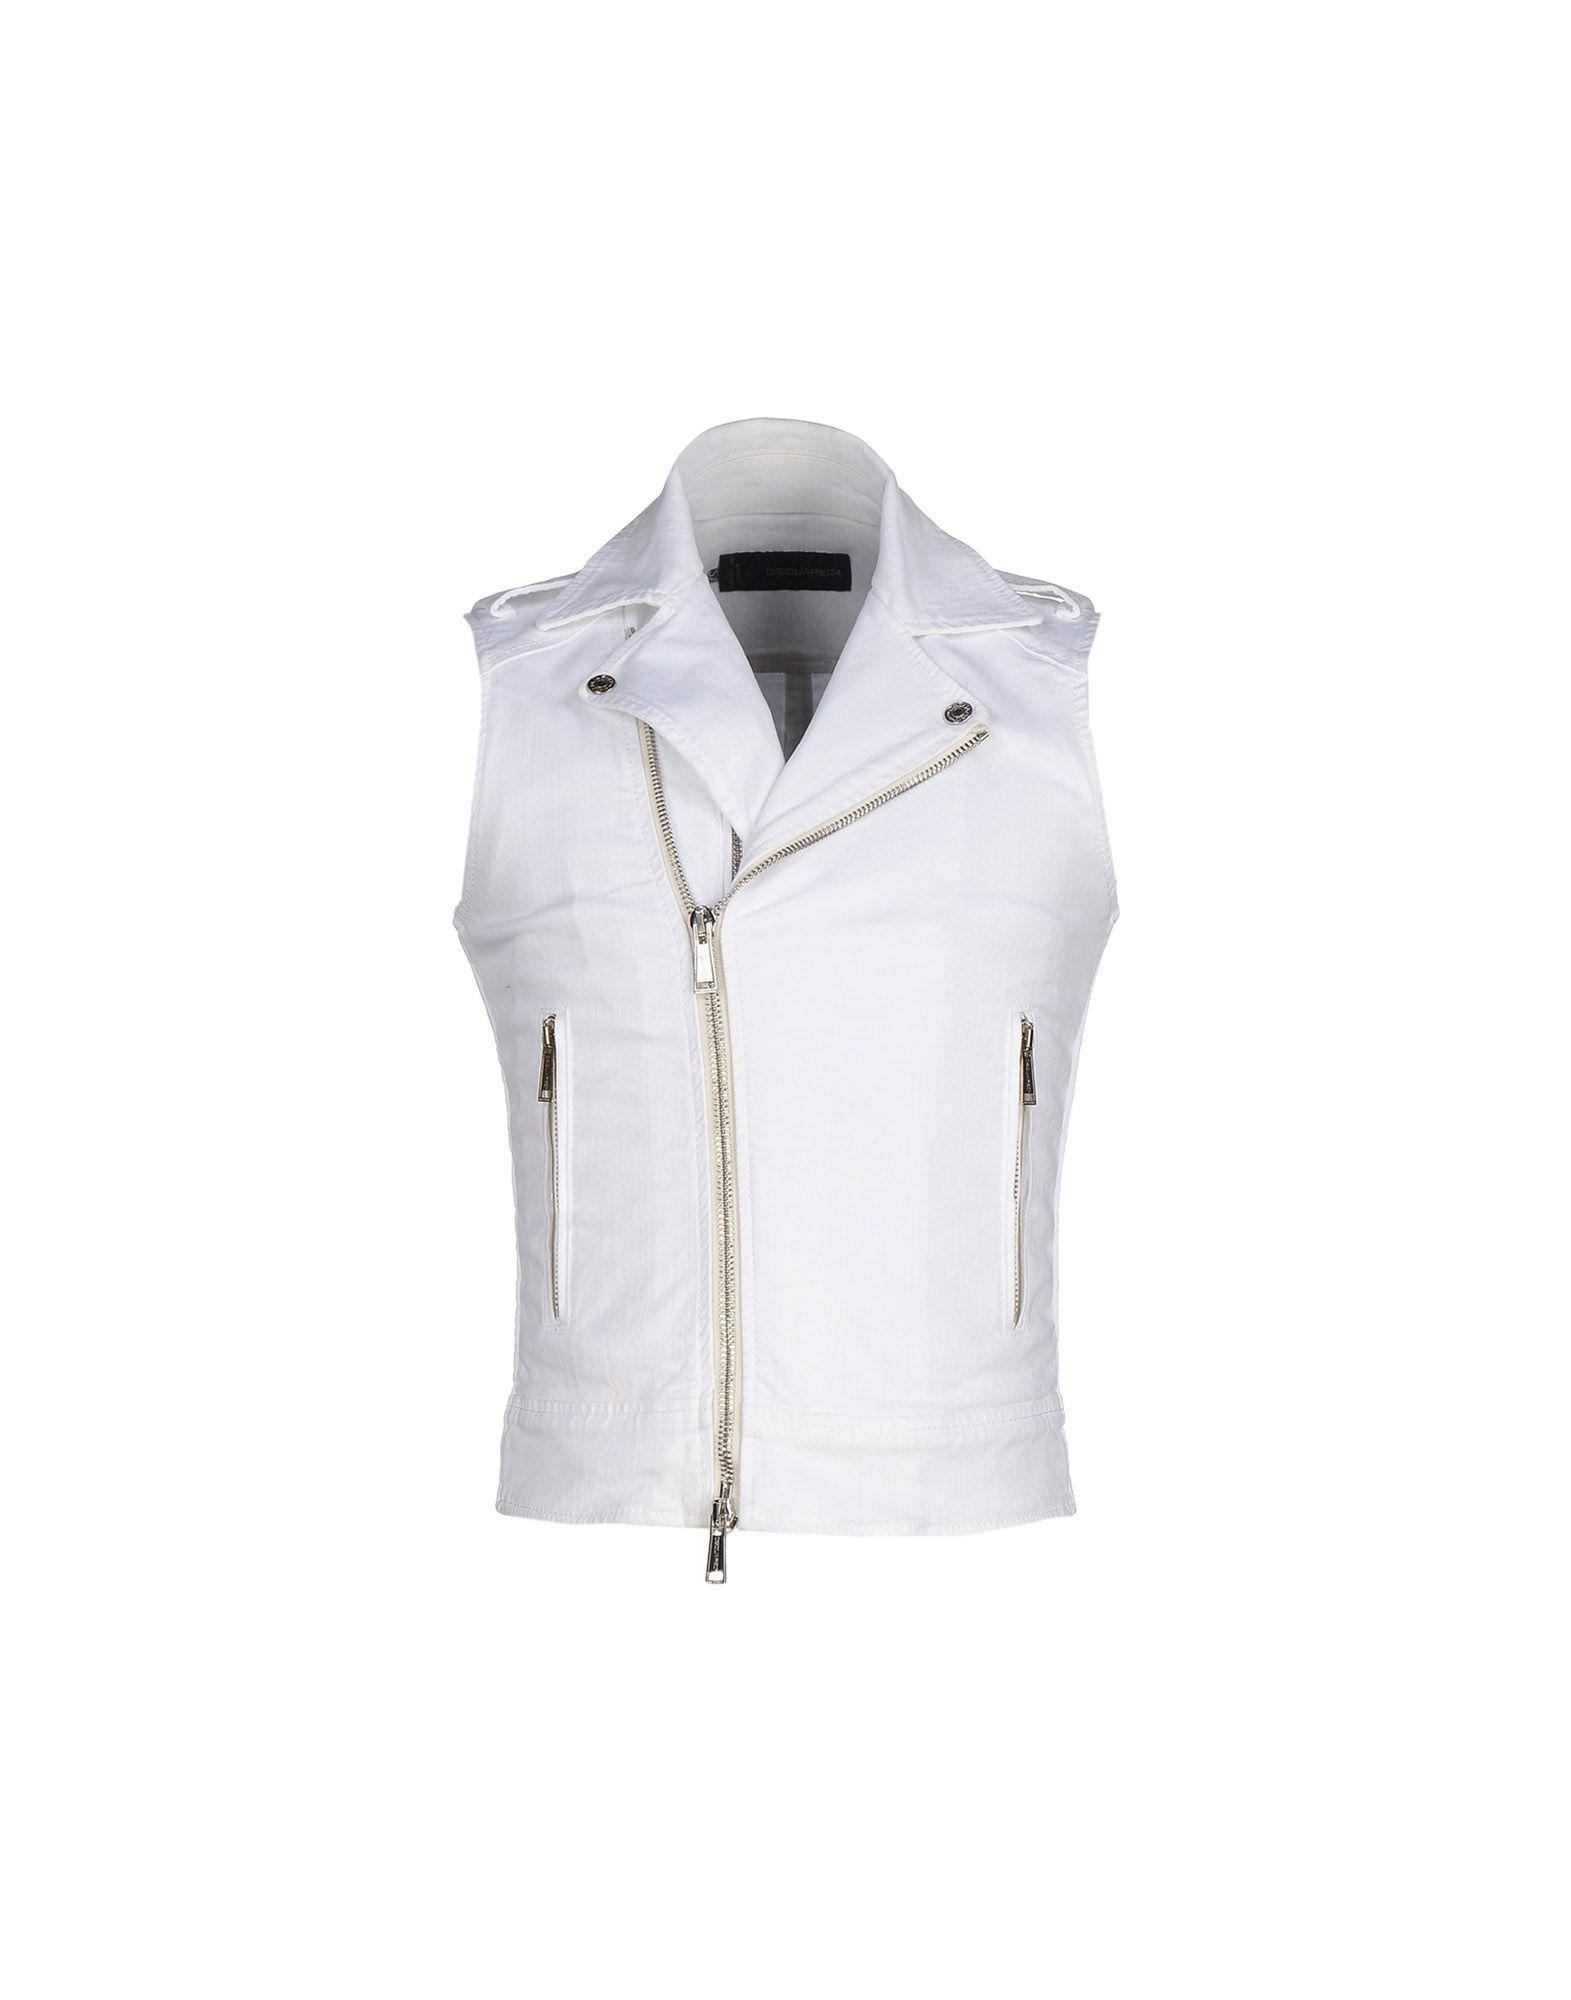 00911ca0f03ff6 Lyst - Dsquared² Denim Outerwear in White for Men